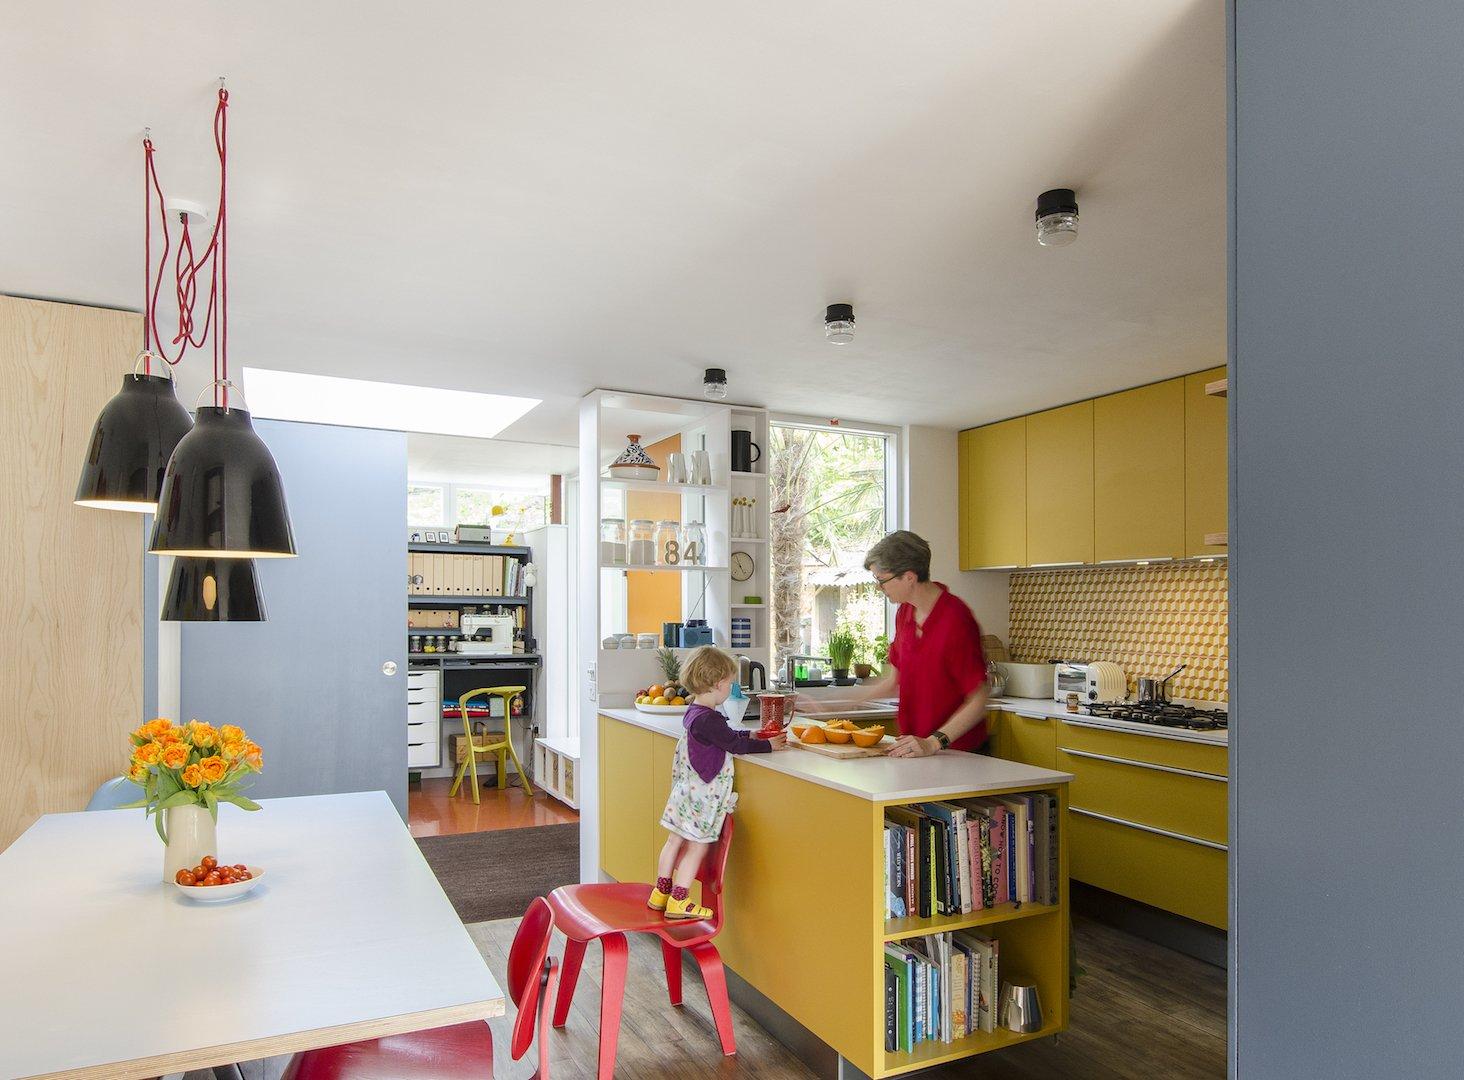 Delawyk Modular House kitchen by R2 Studio Architects